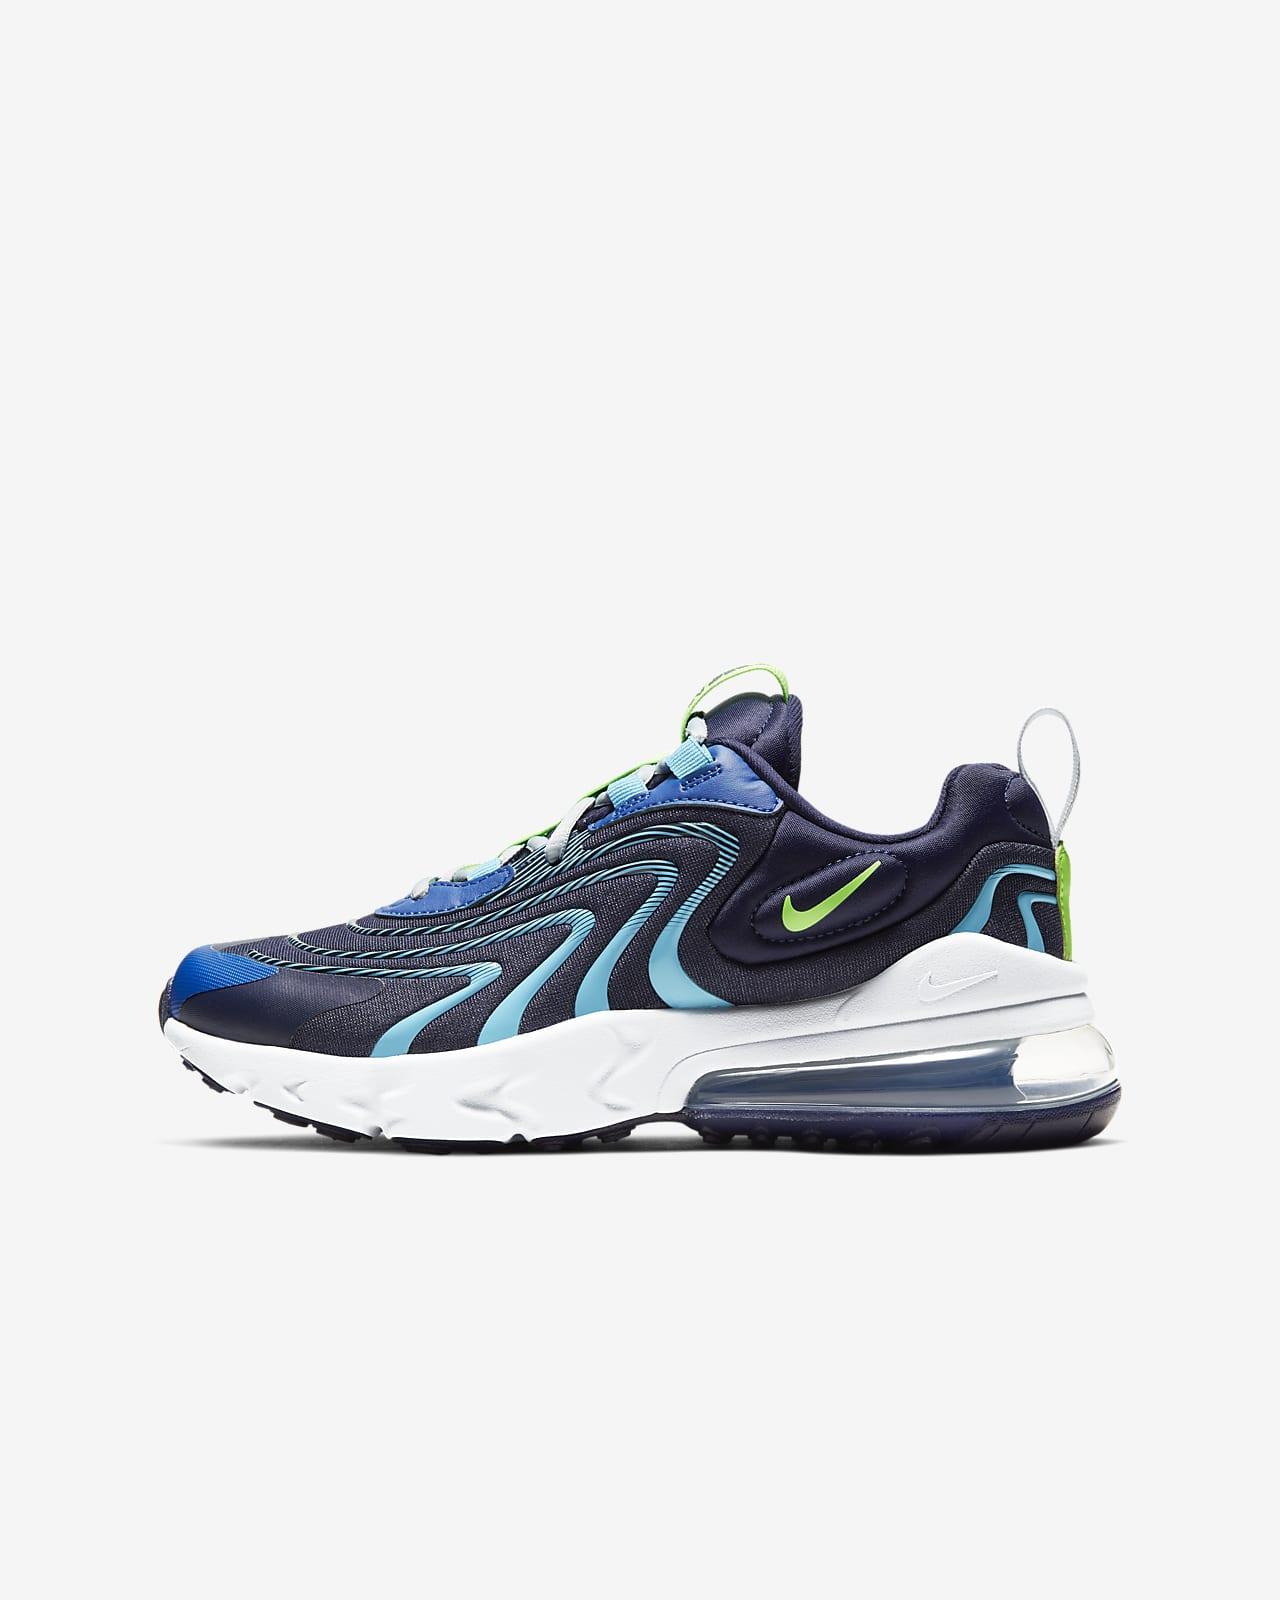 Nike Air Max 270 React ENG Schuh für ältere Kinder